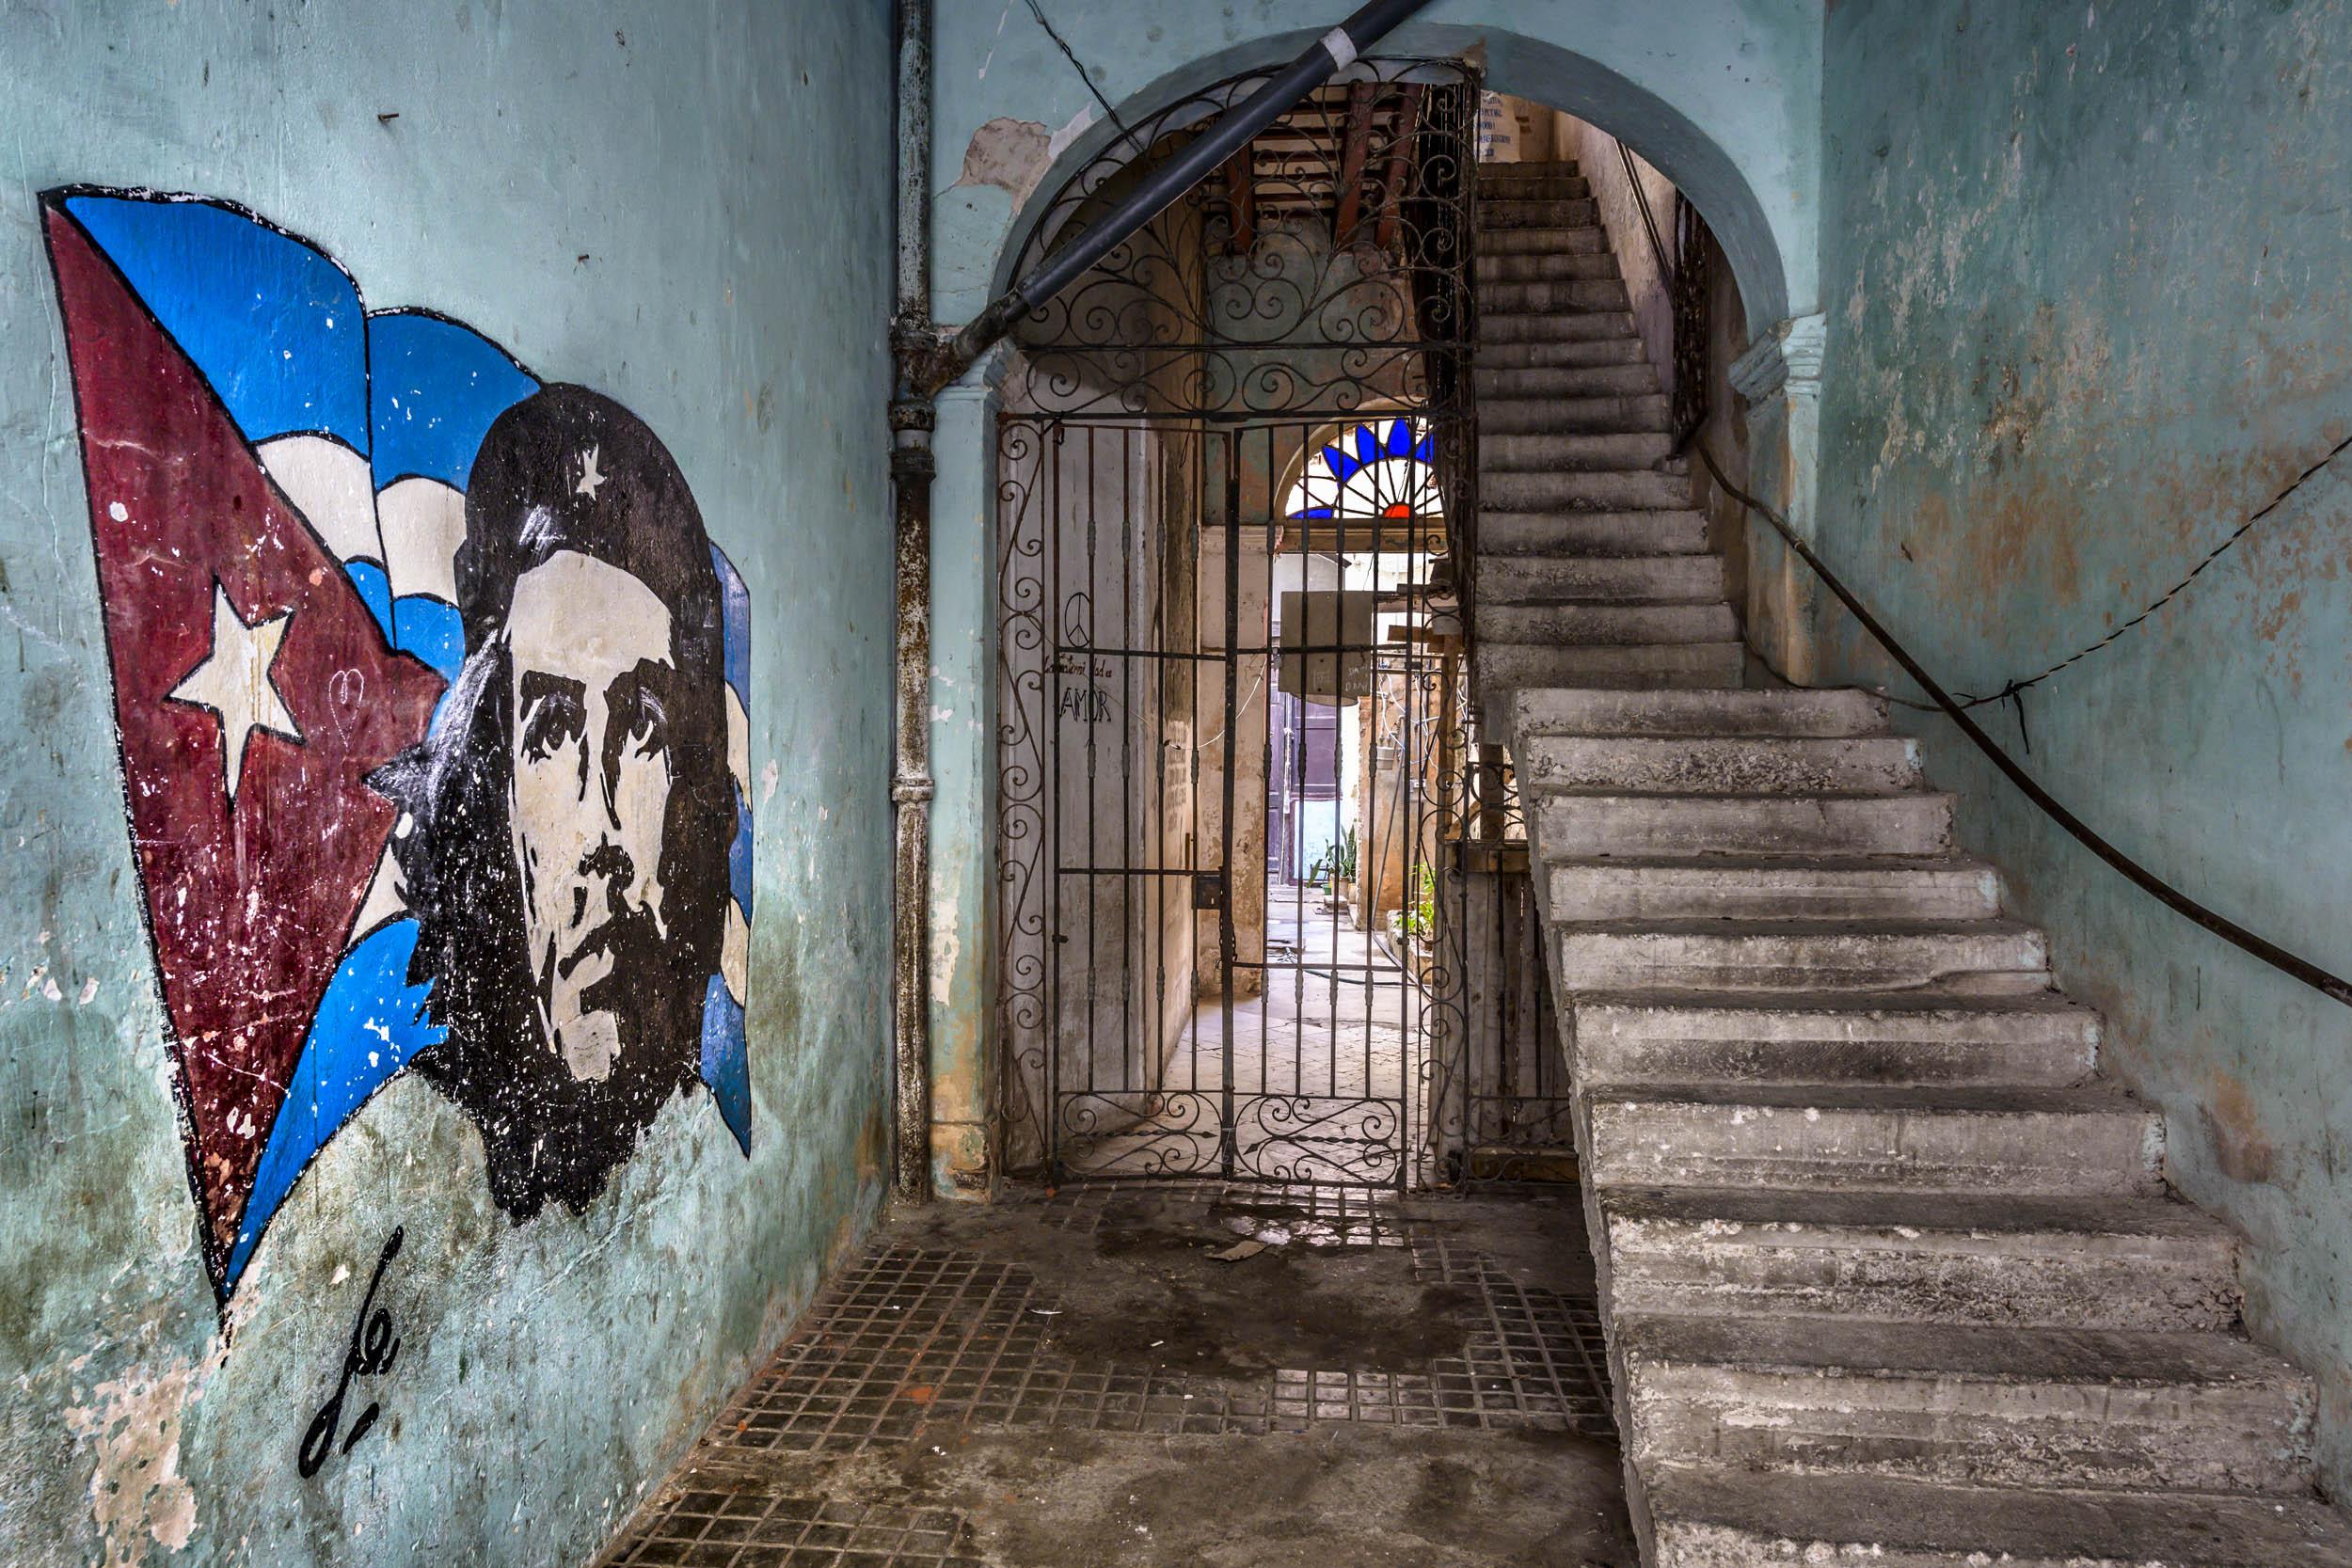 Espacio en perspectiva - Cuba - Hector Garrido, Aerial and human photography